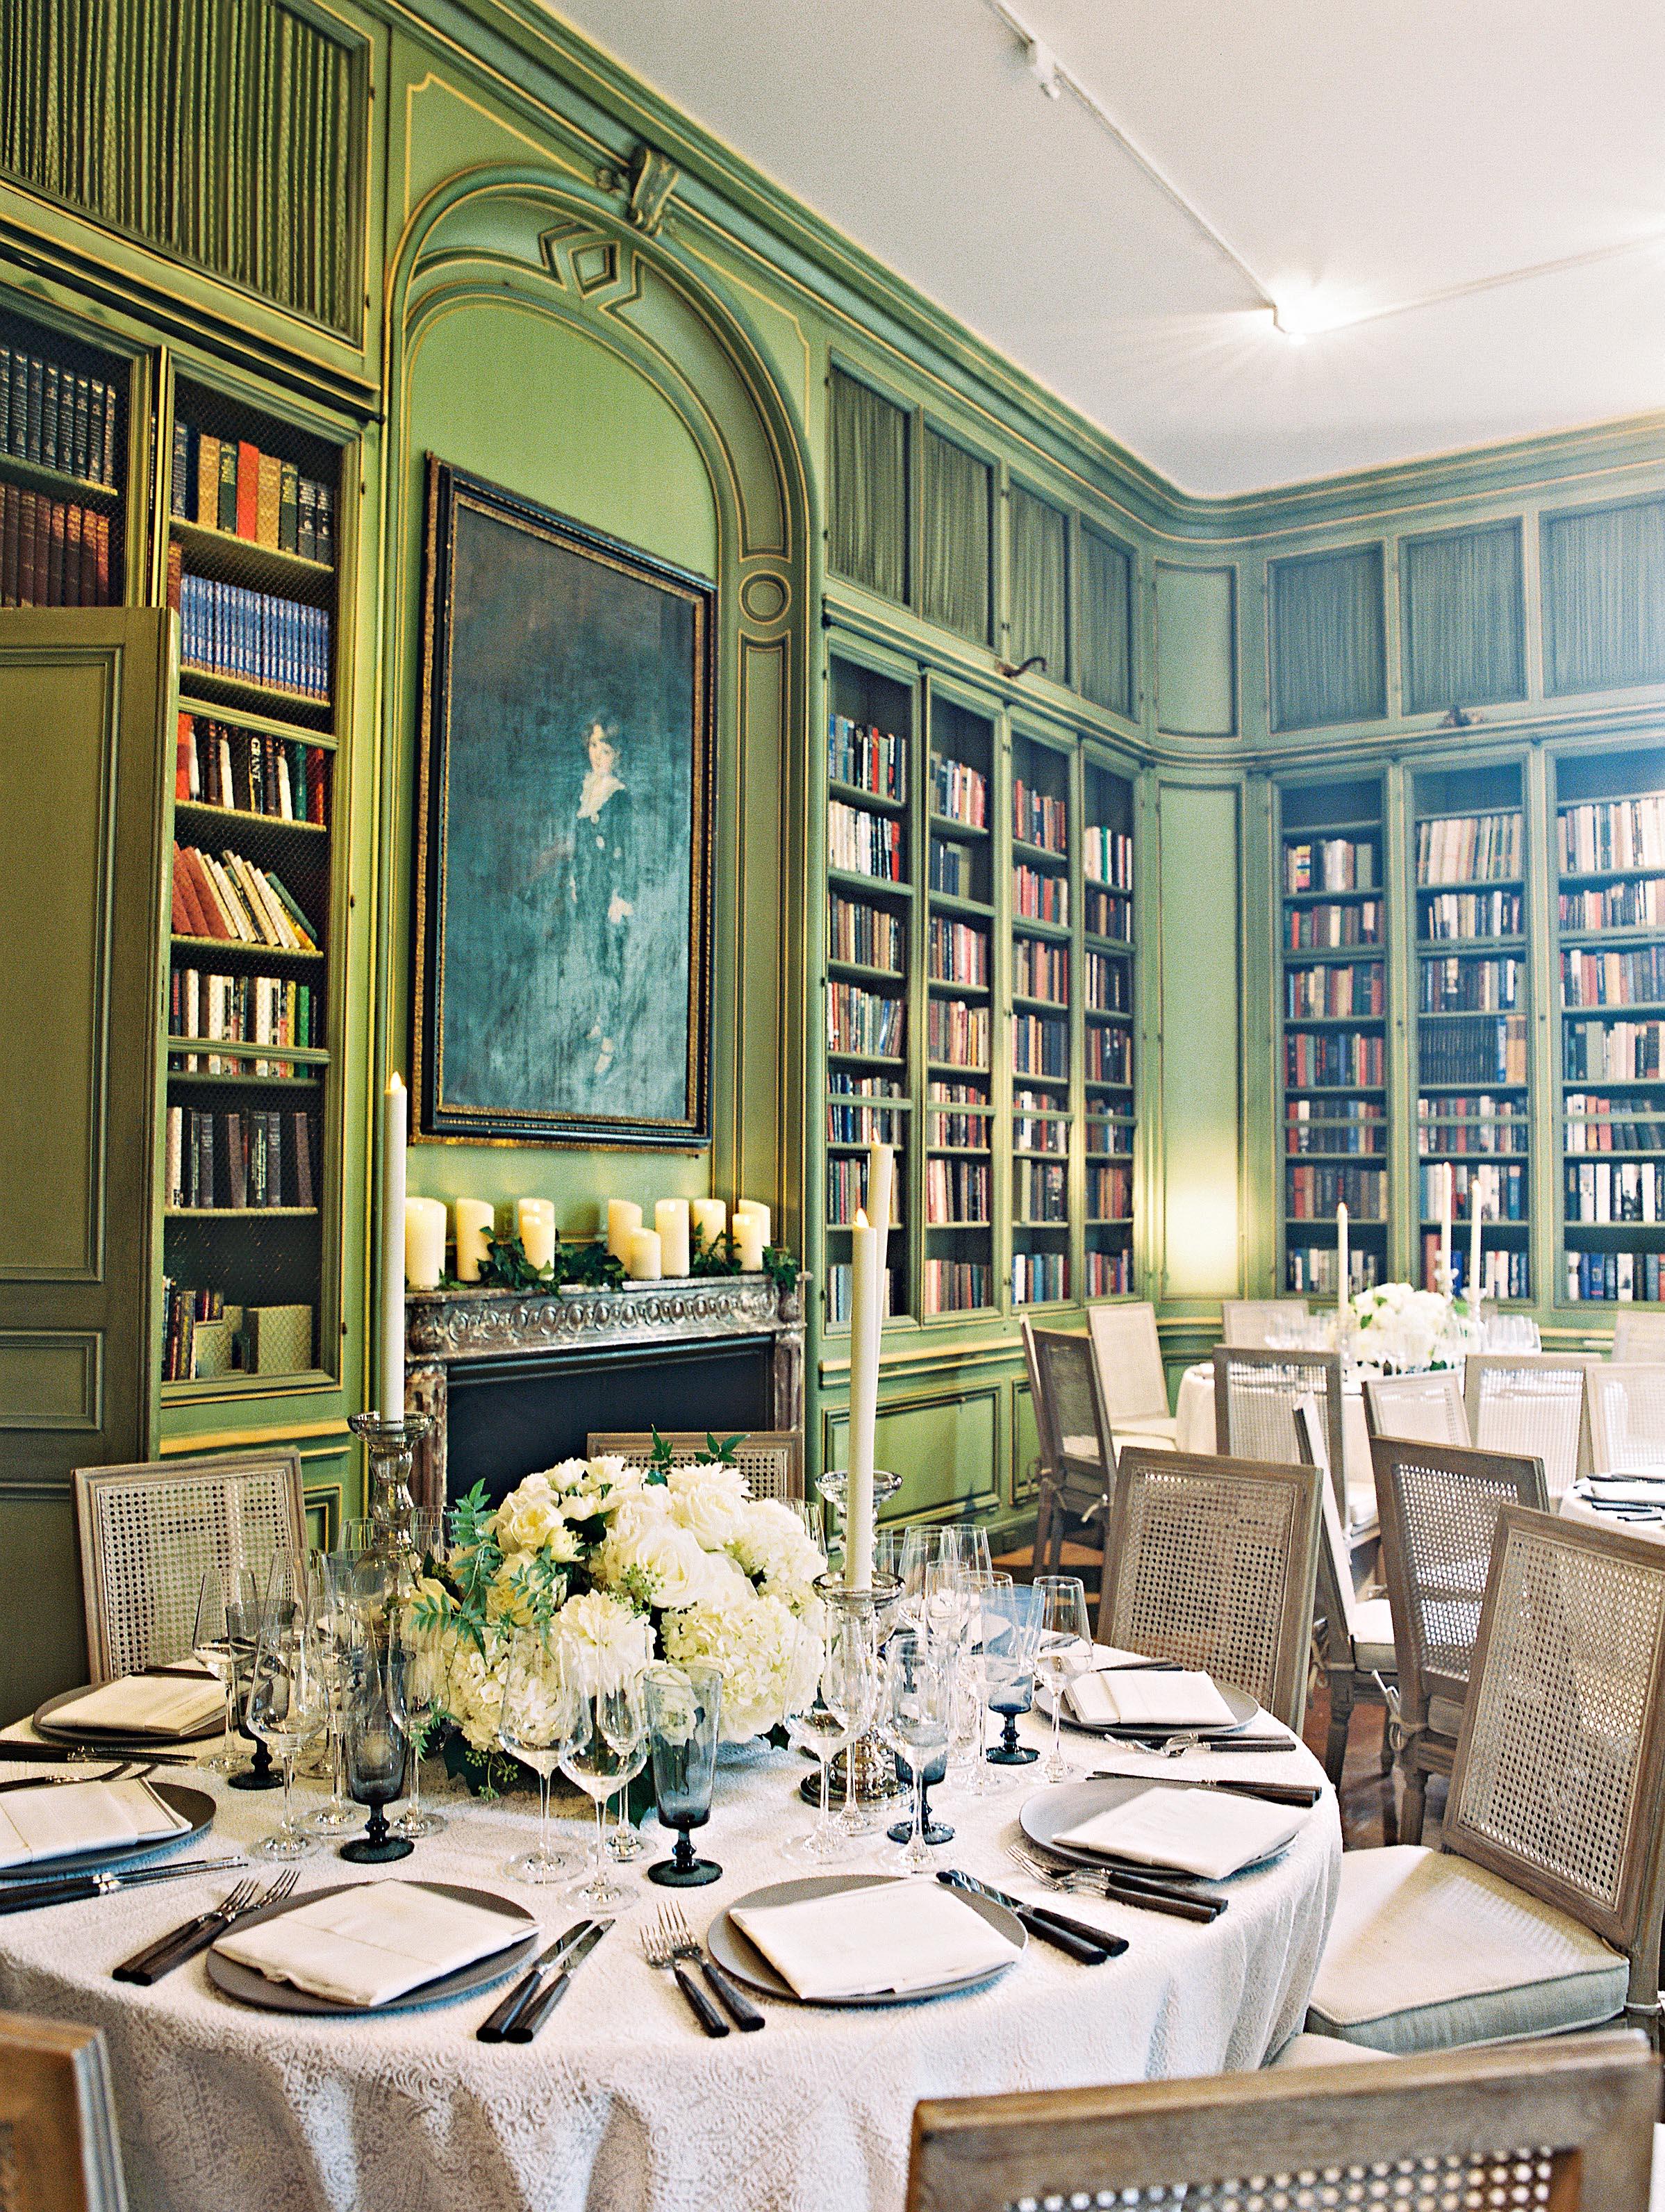 jermaine scott wedding dc library